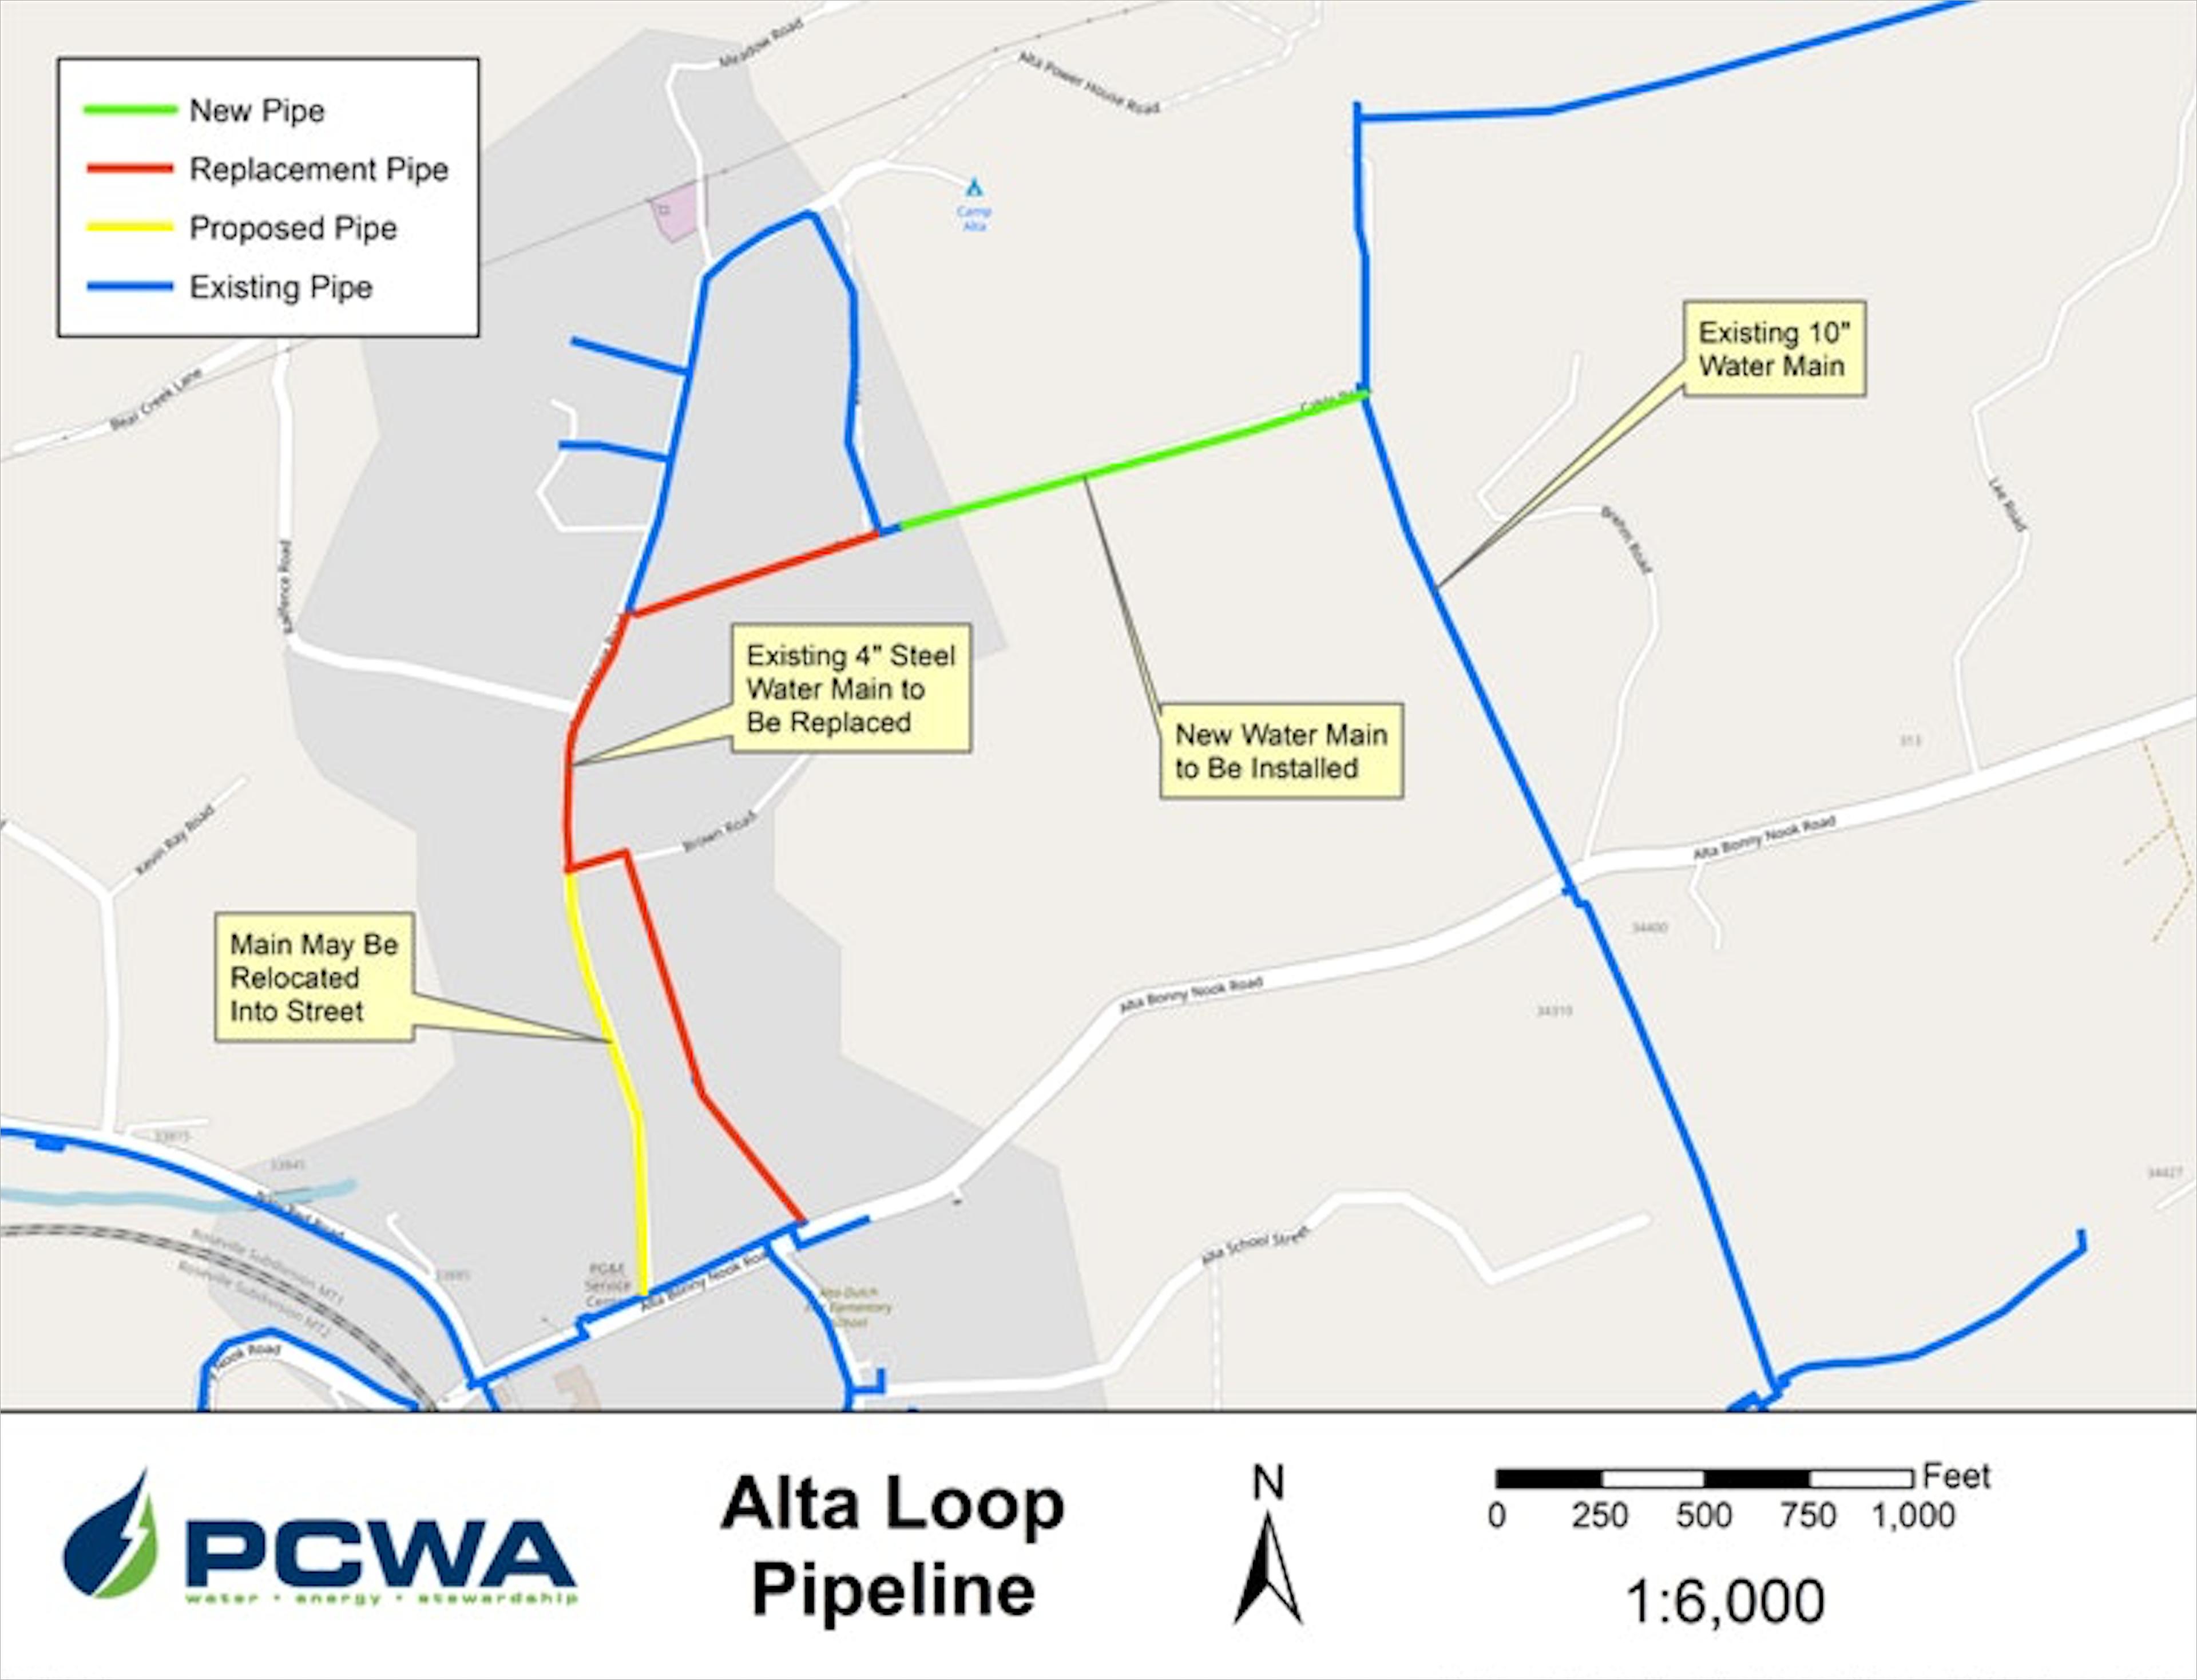 Map Figure of Alta Loop Pipeline Project